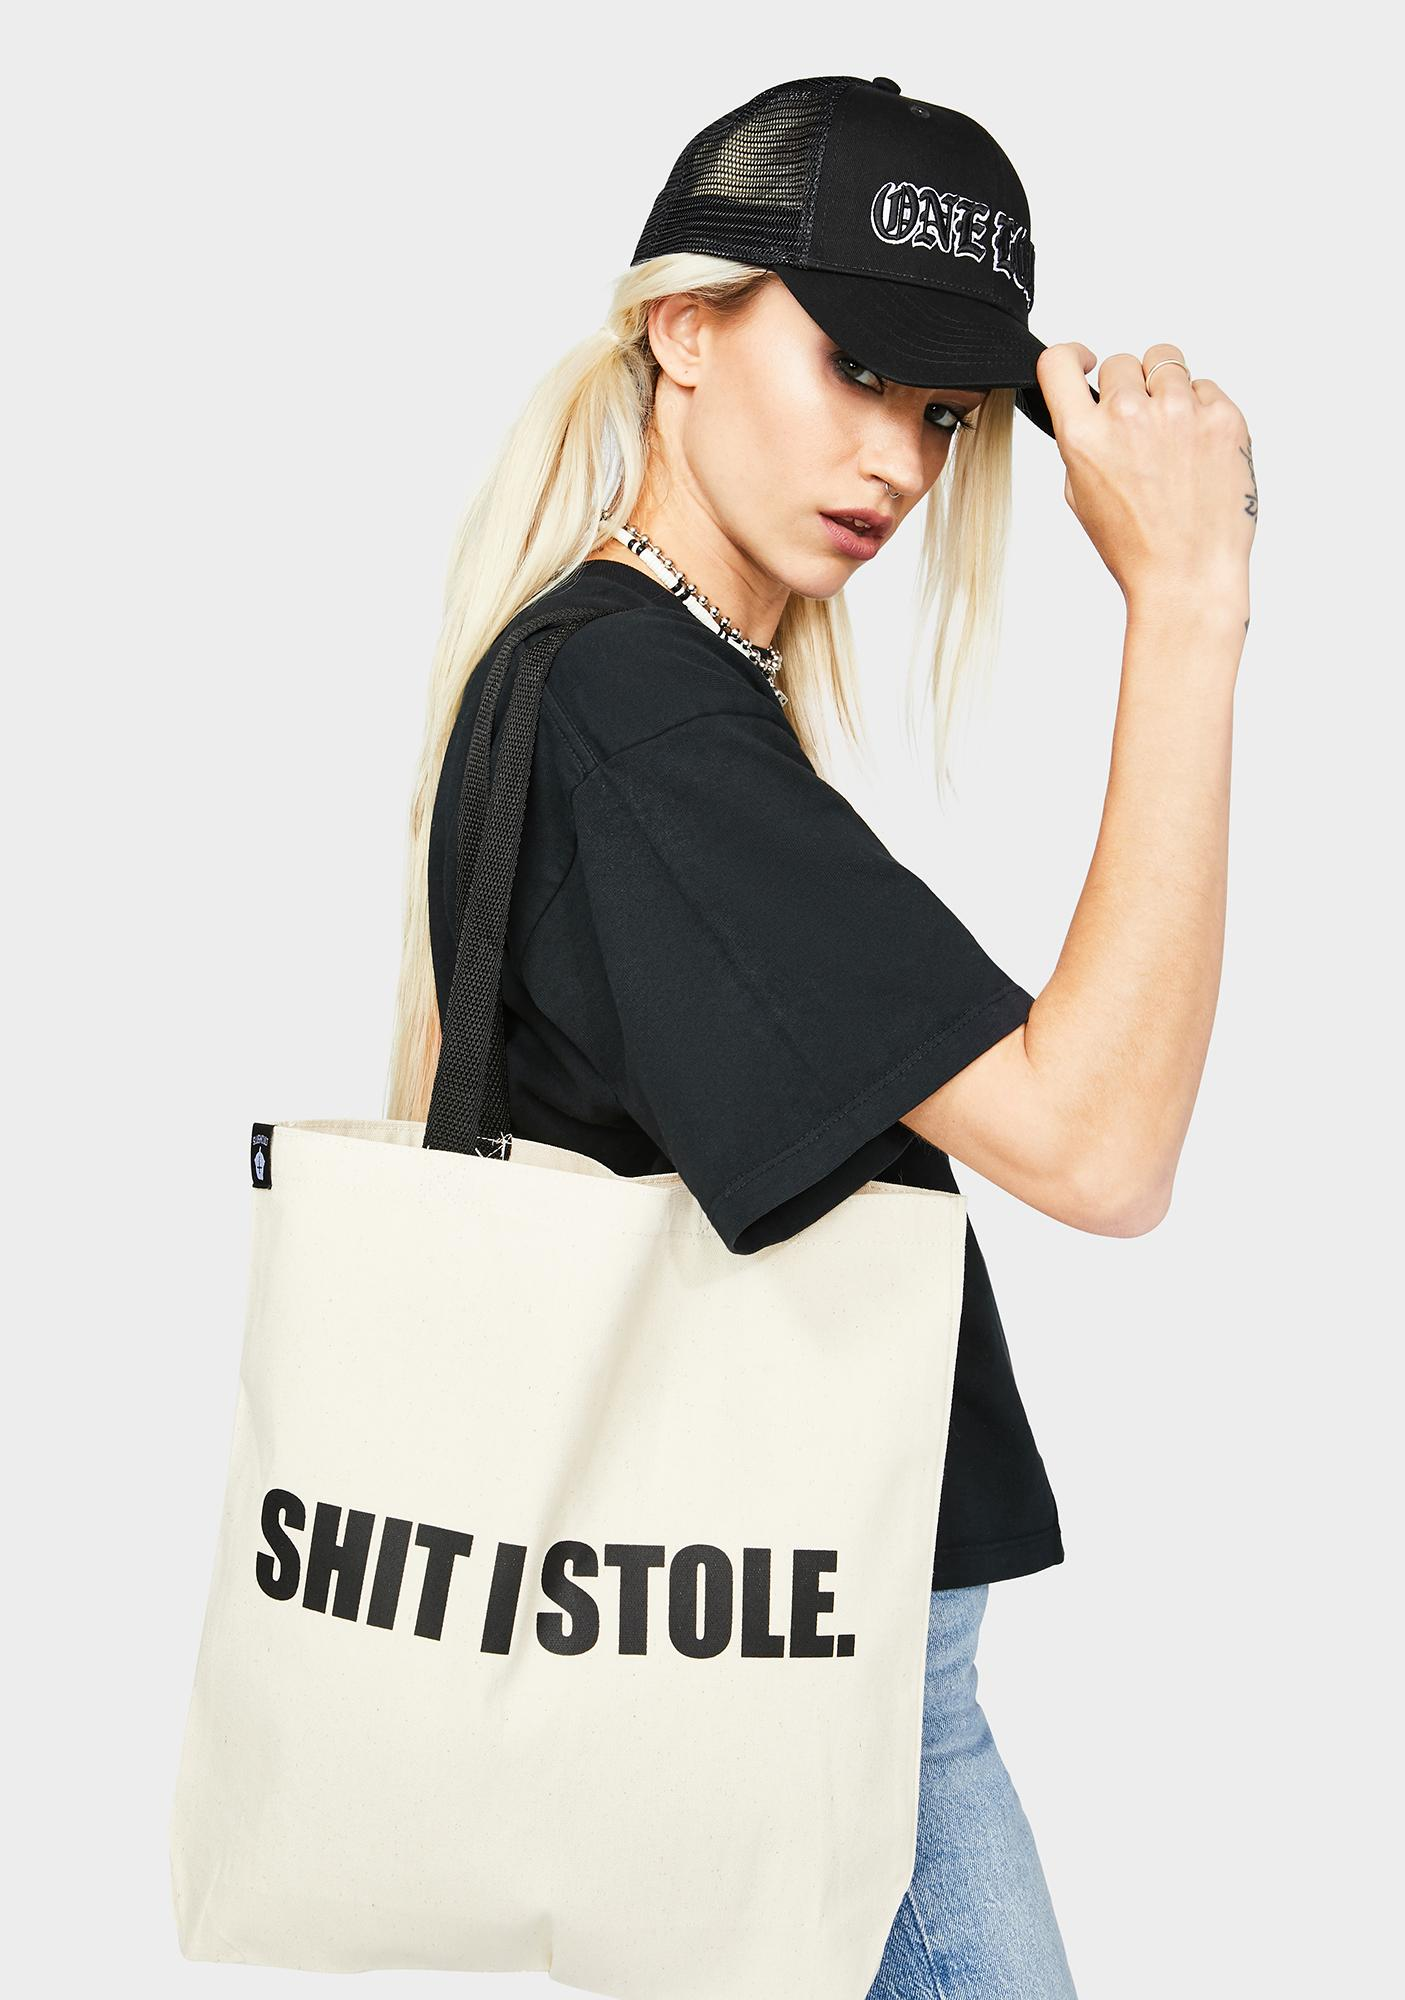 Slushcult Shit I Stole Tote Bag